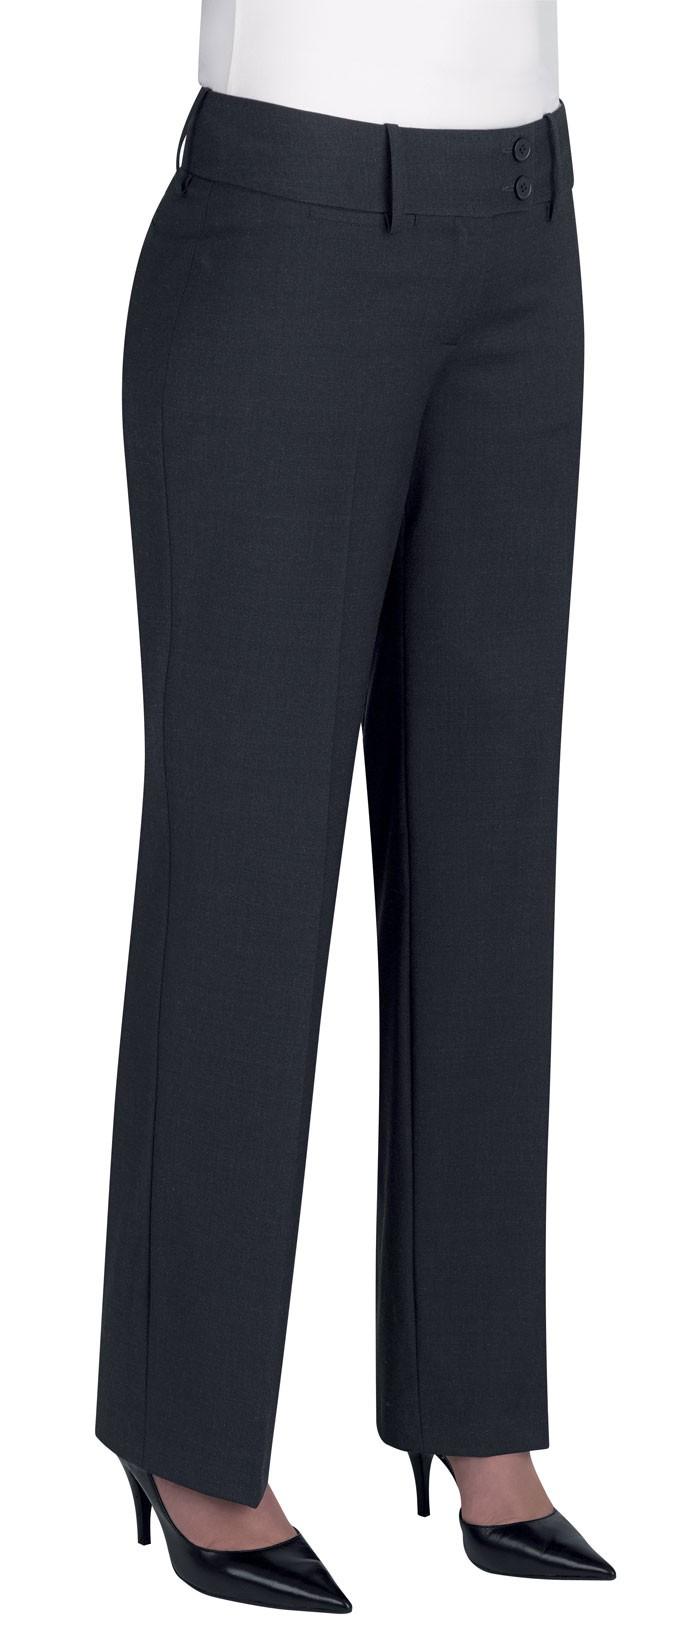 Parallel Leg Trousers